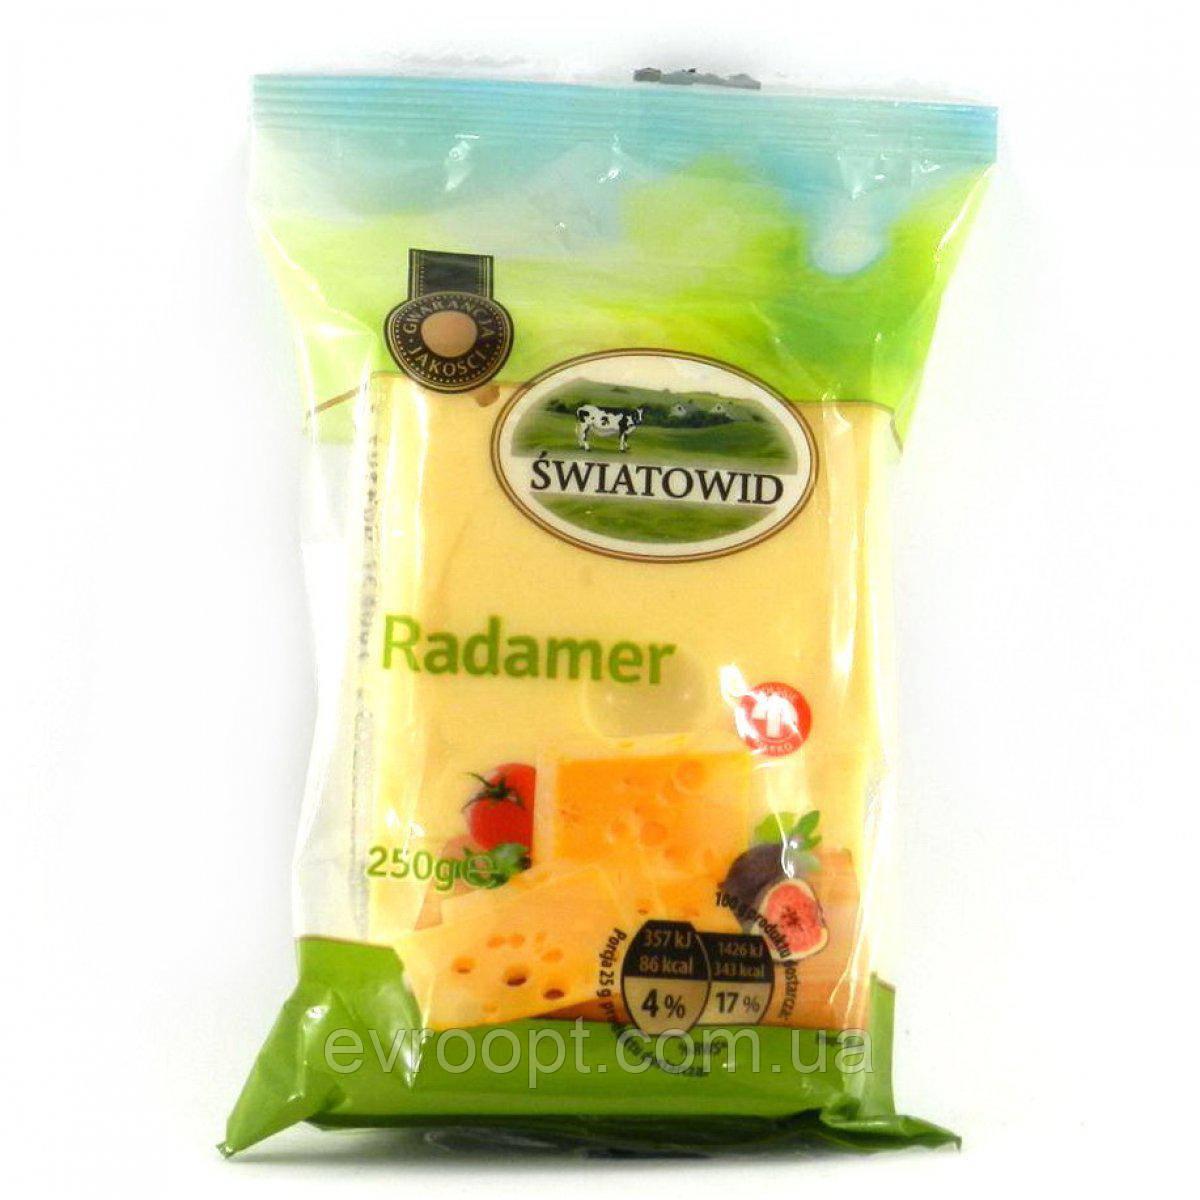 Сыр Swiatowid Radamer 250г гр.